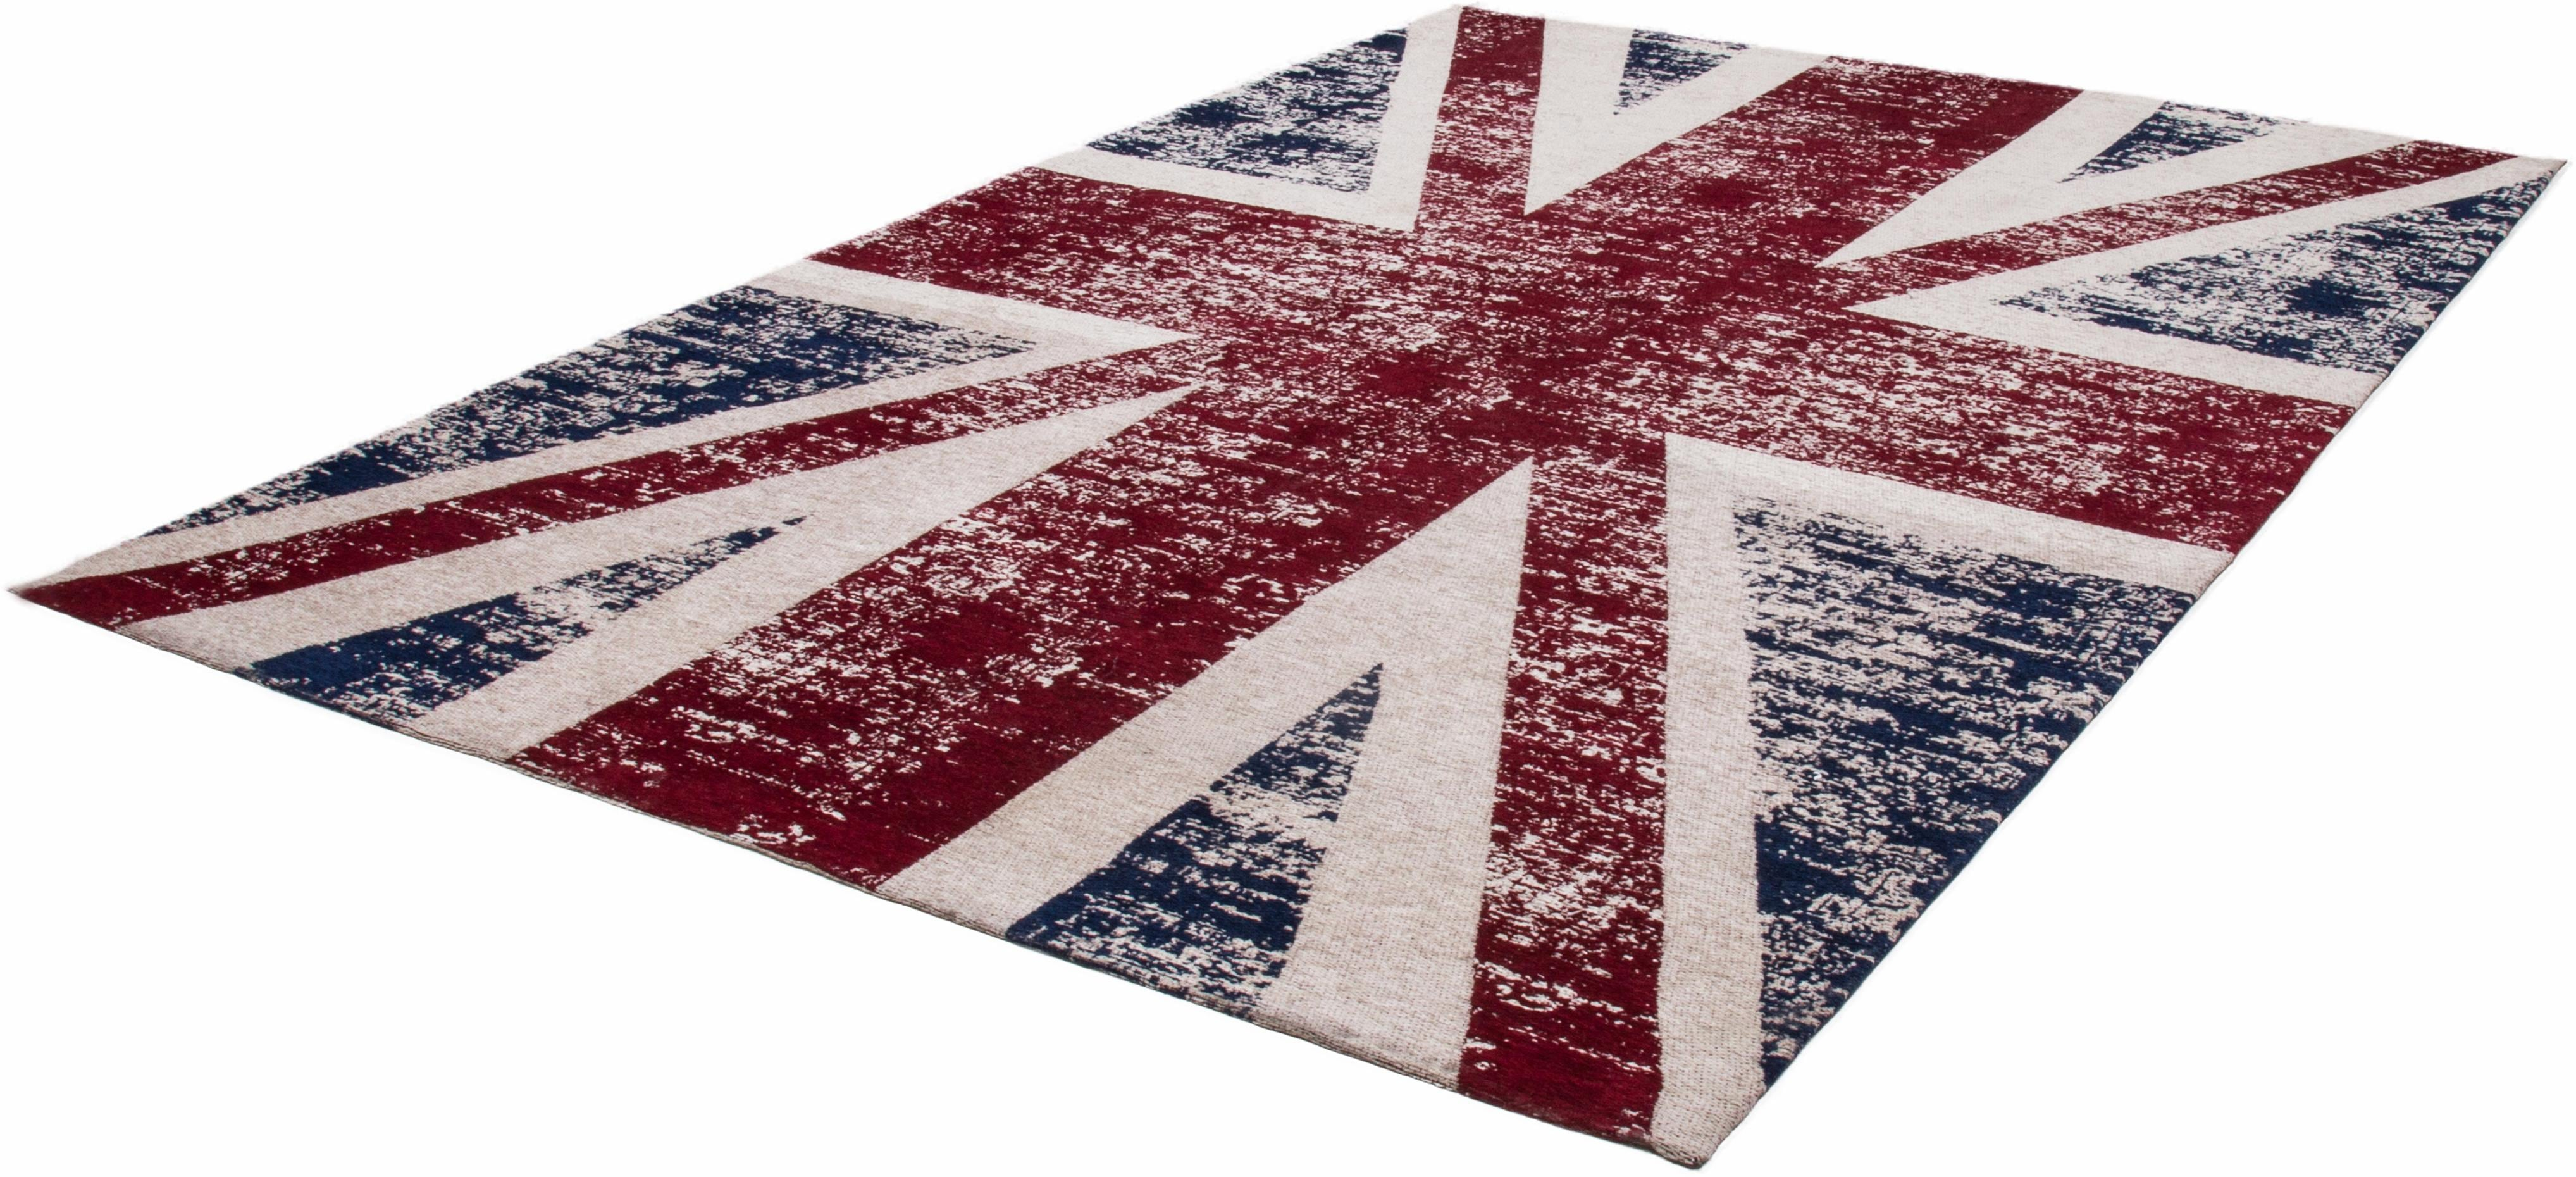 Teppich Cocoon 996 LALEE rechteckig Höhe 10 mm handgewebt